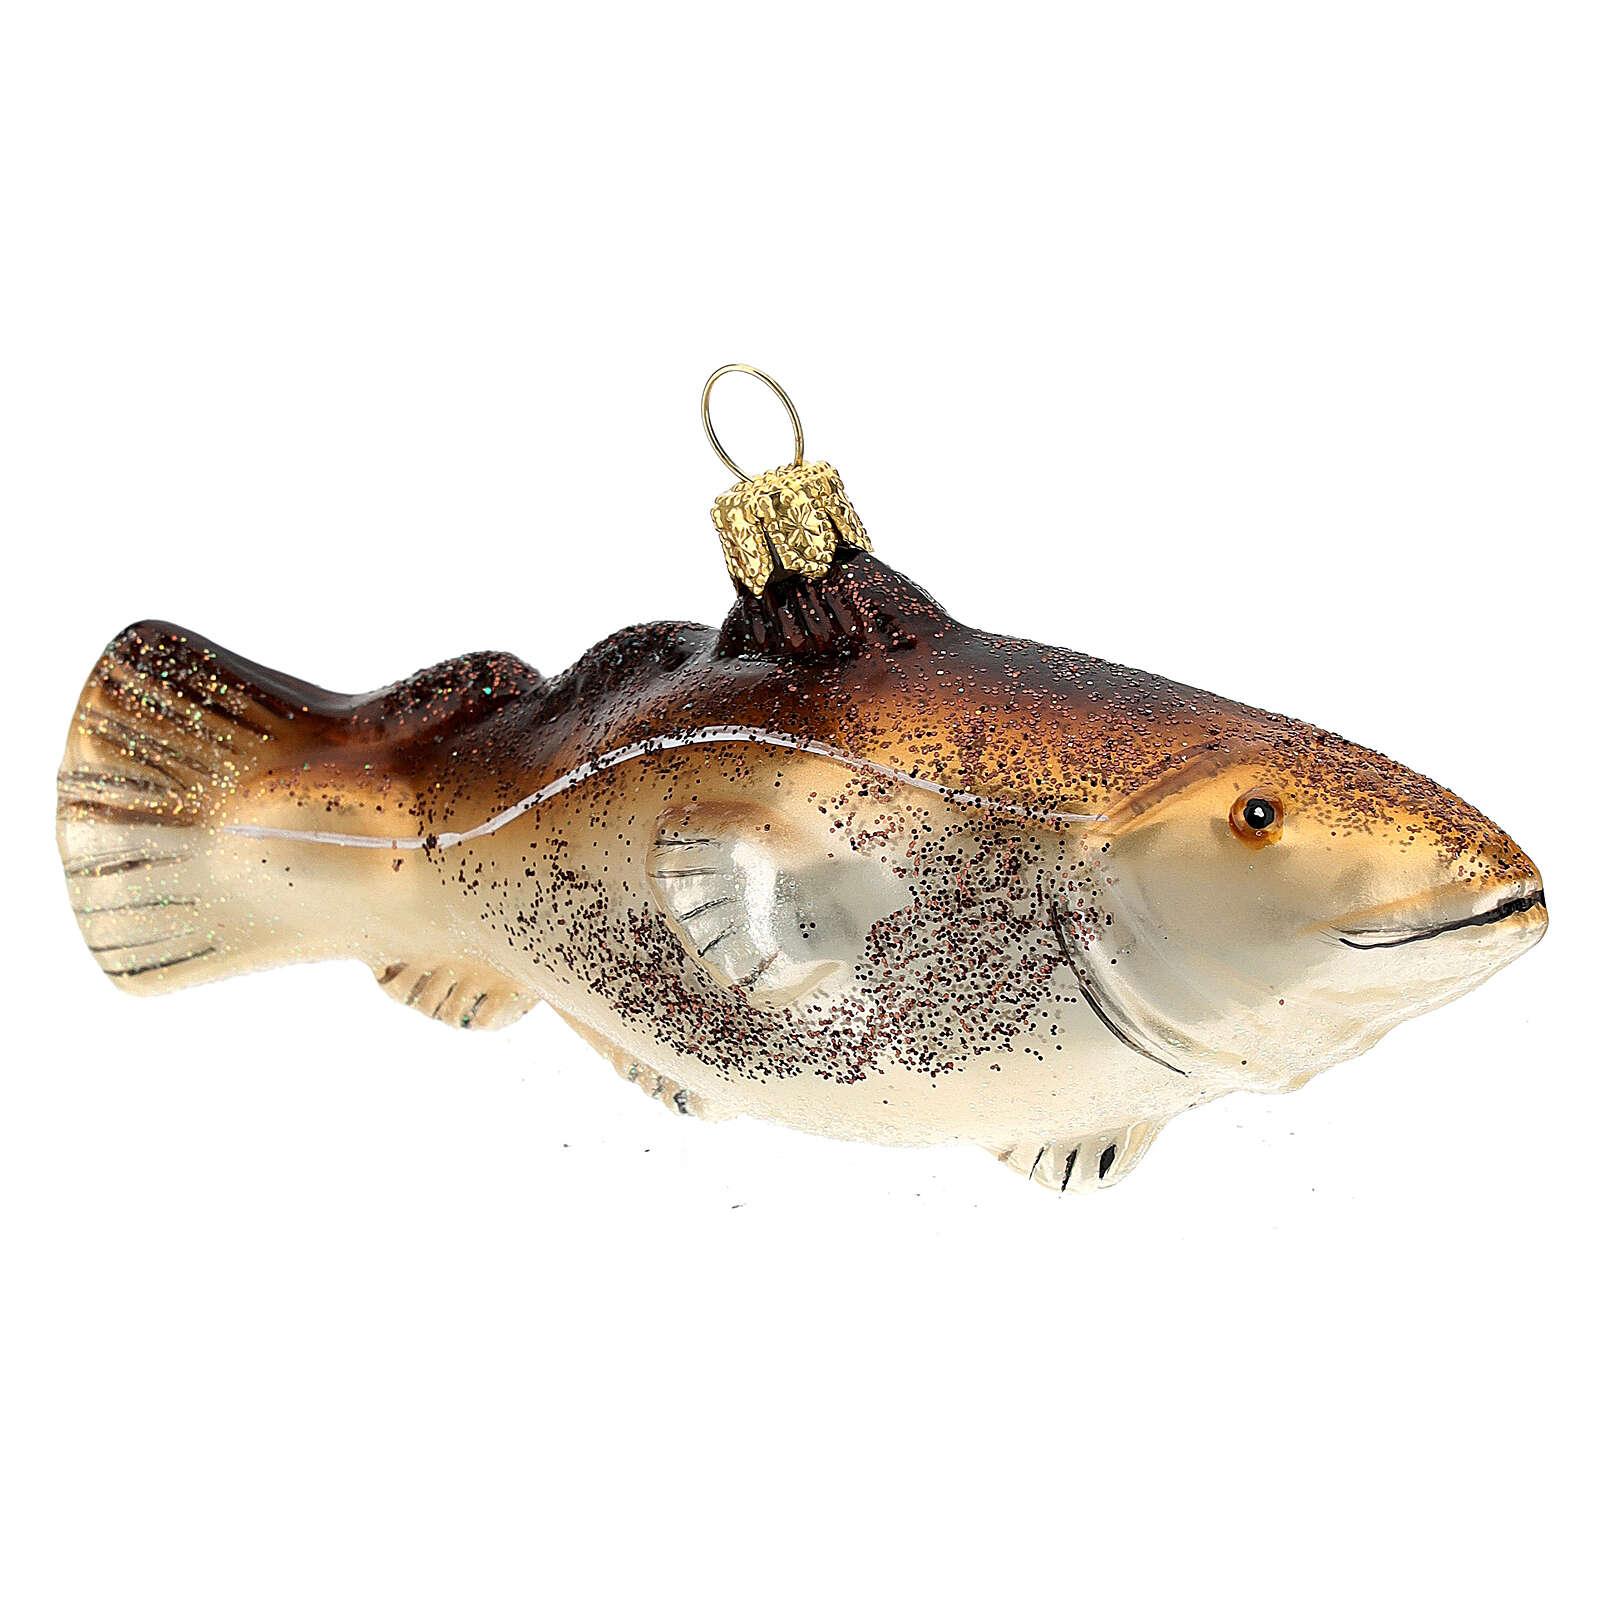 Blown glass Christmas ornament, cod fish 4